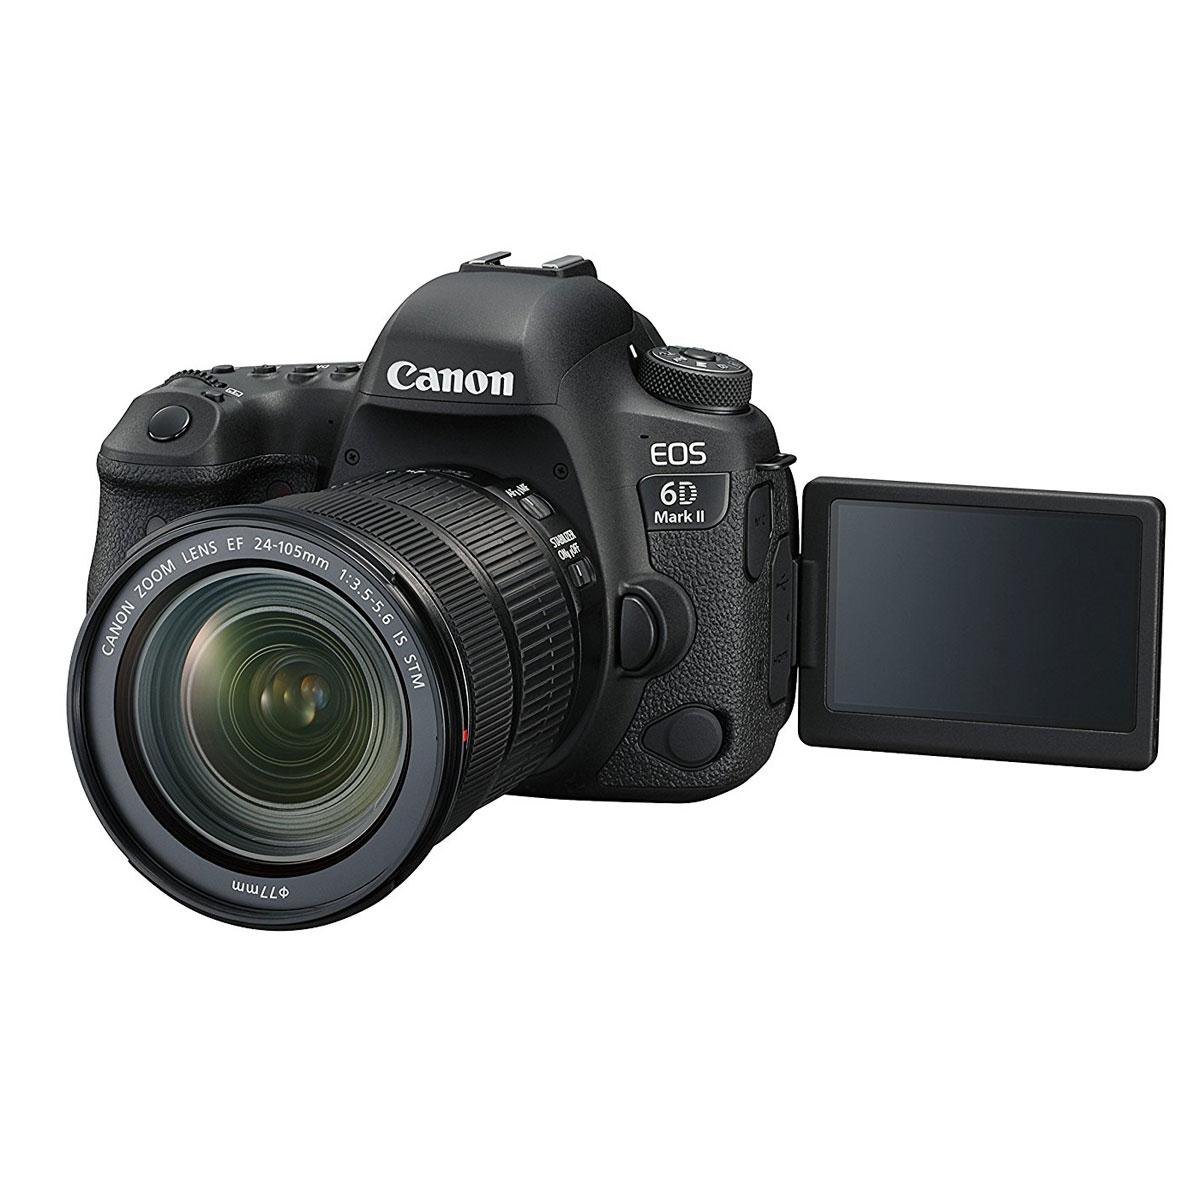 canon eos 6d mark ii 24 105 is stm appareil photo reflex canon sur. Black Bedroom Furniture Sets. Home Design Ideas